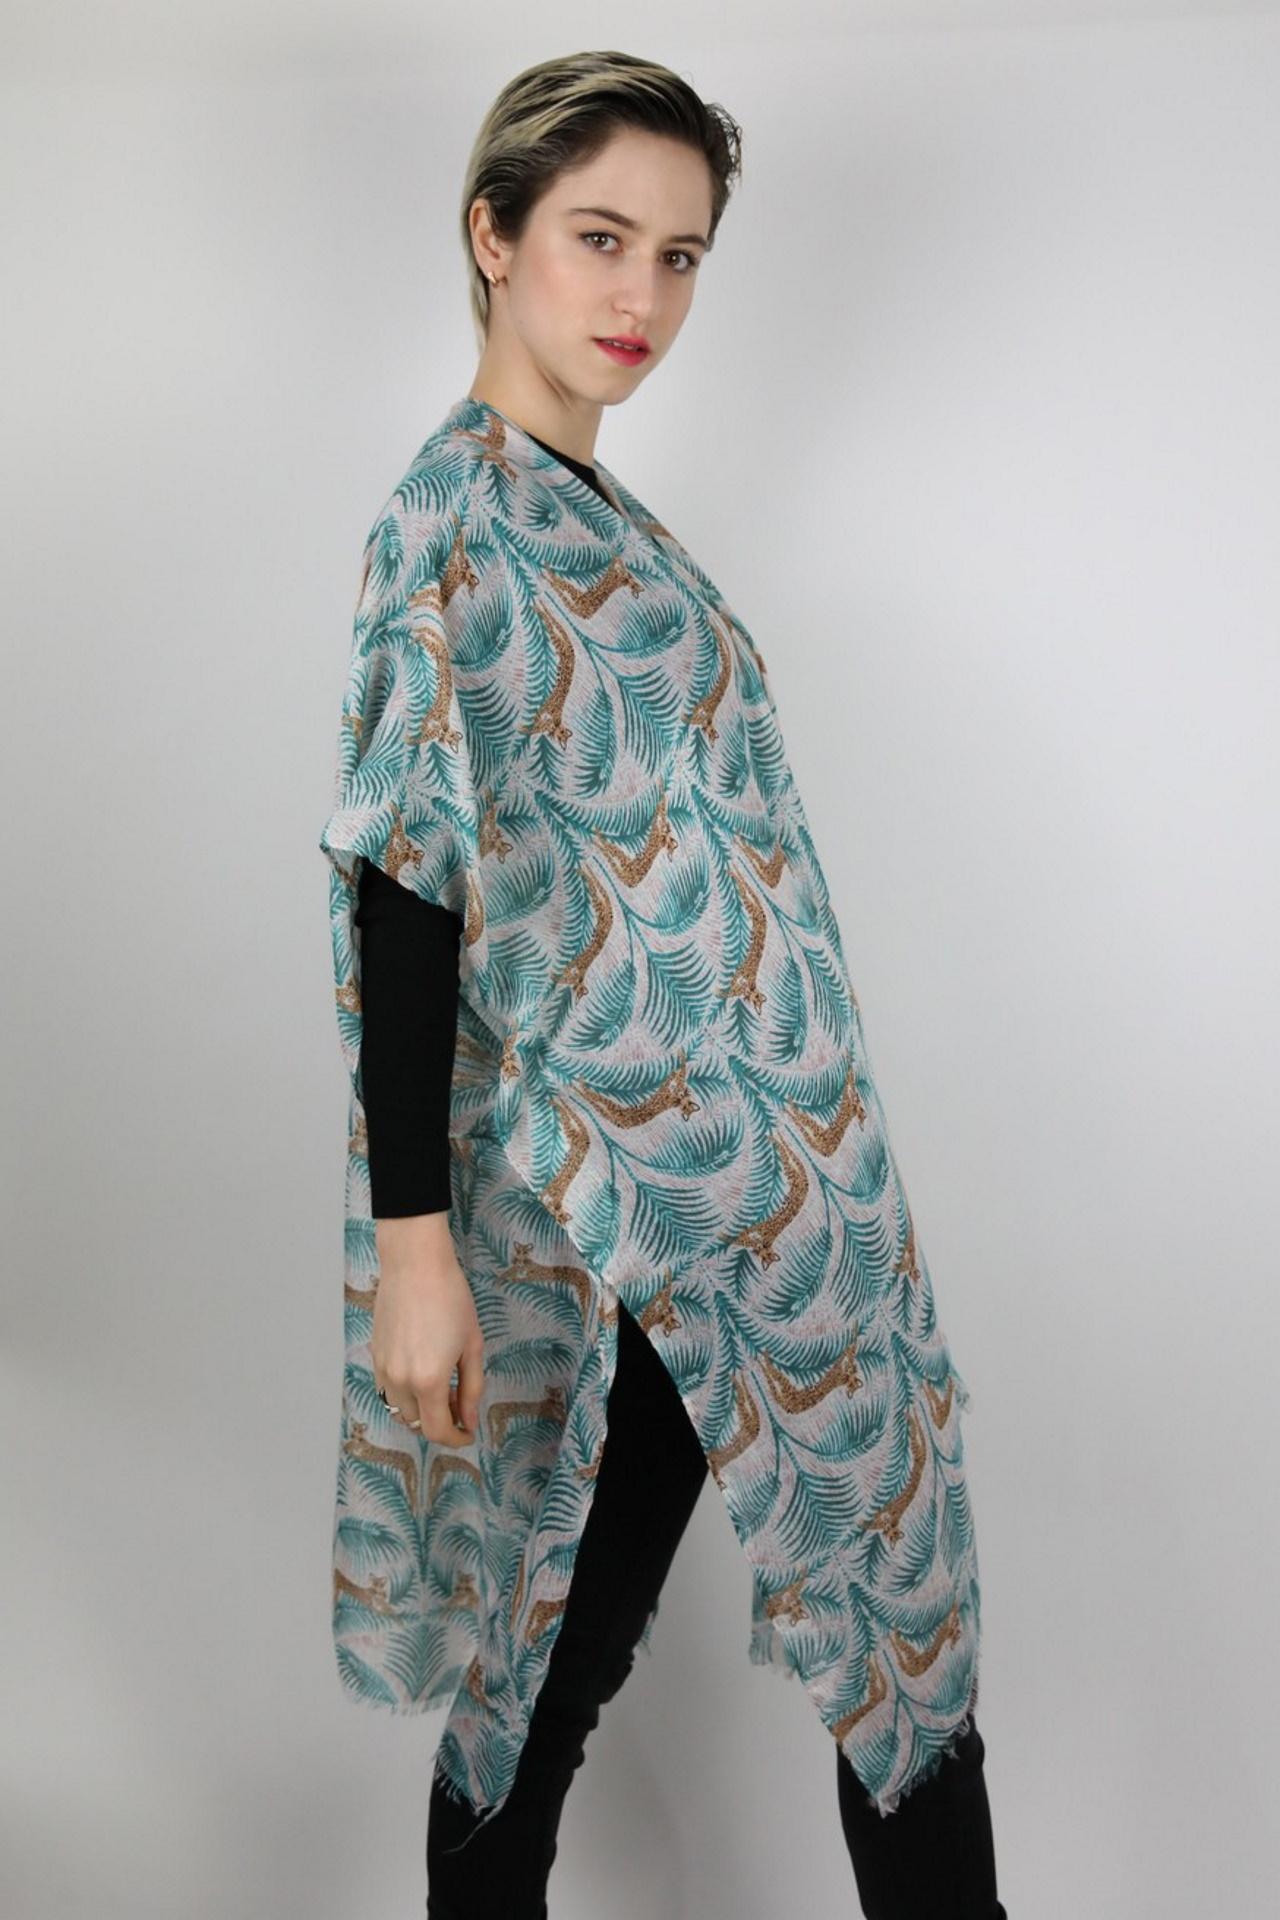 CLOTHES11 STOLA DONNA FOULARD CARDIGAN COPRISPALLE 3 1stAmerican elegante stola da donna foulard cardigan coprispalle